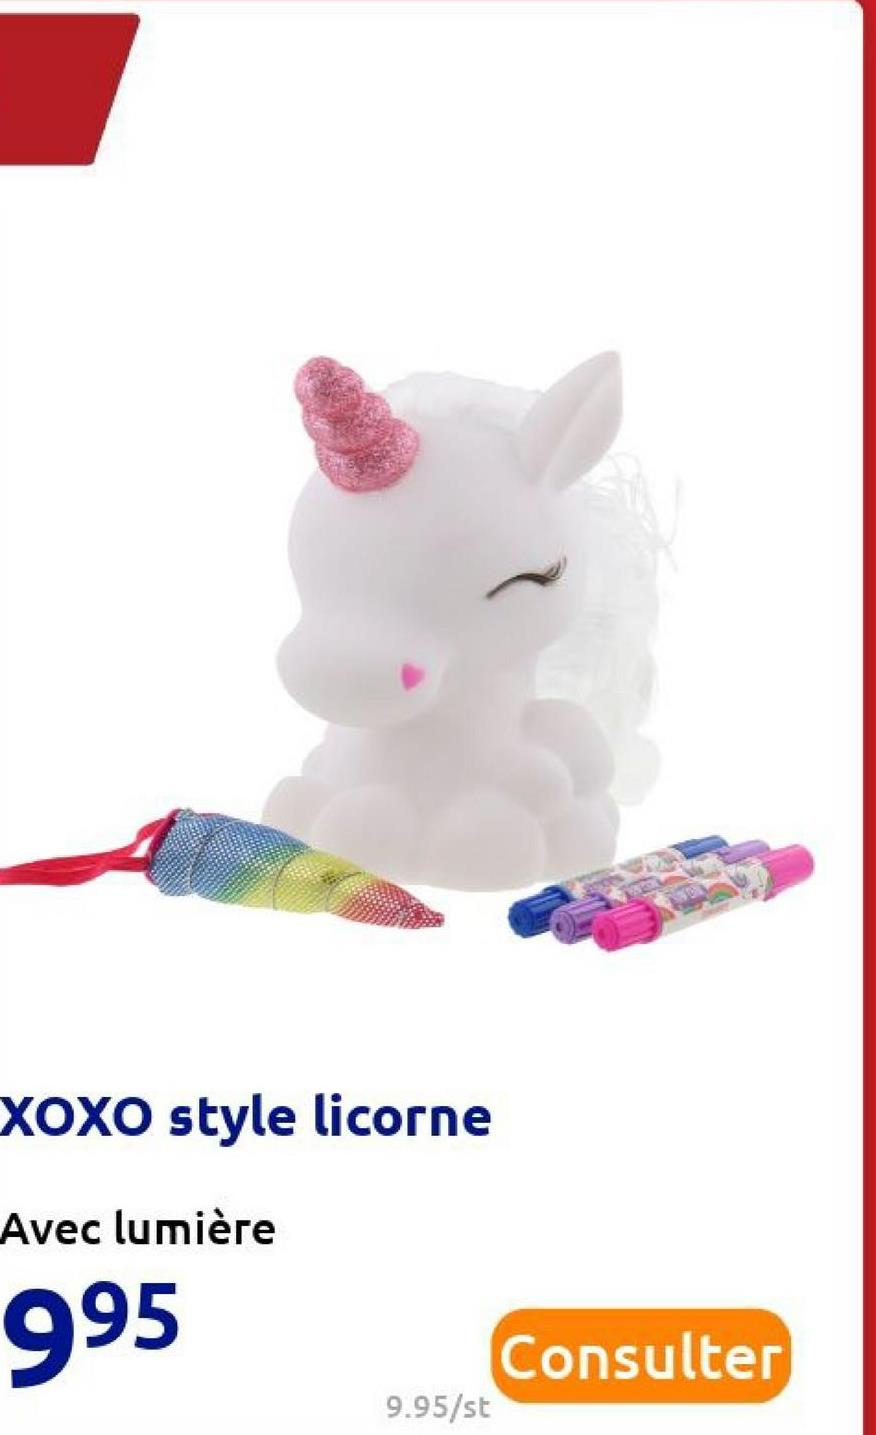 XOXO style licorne Avec lumière 995 Consulter 9.95/st